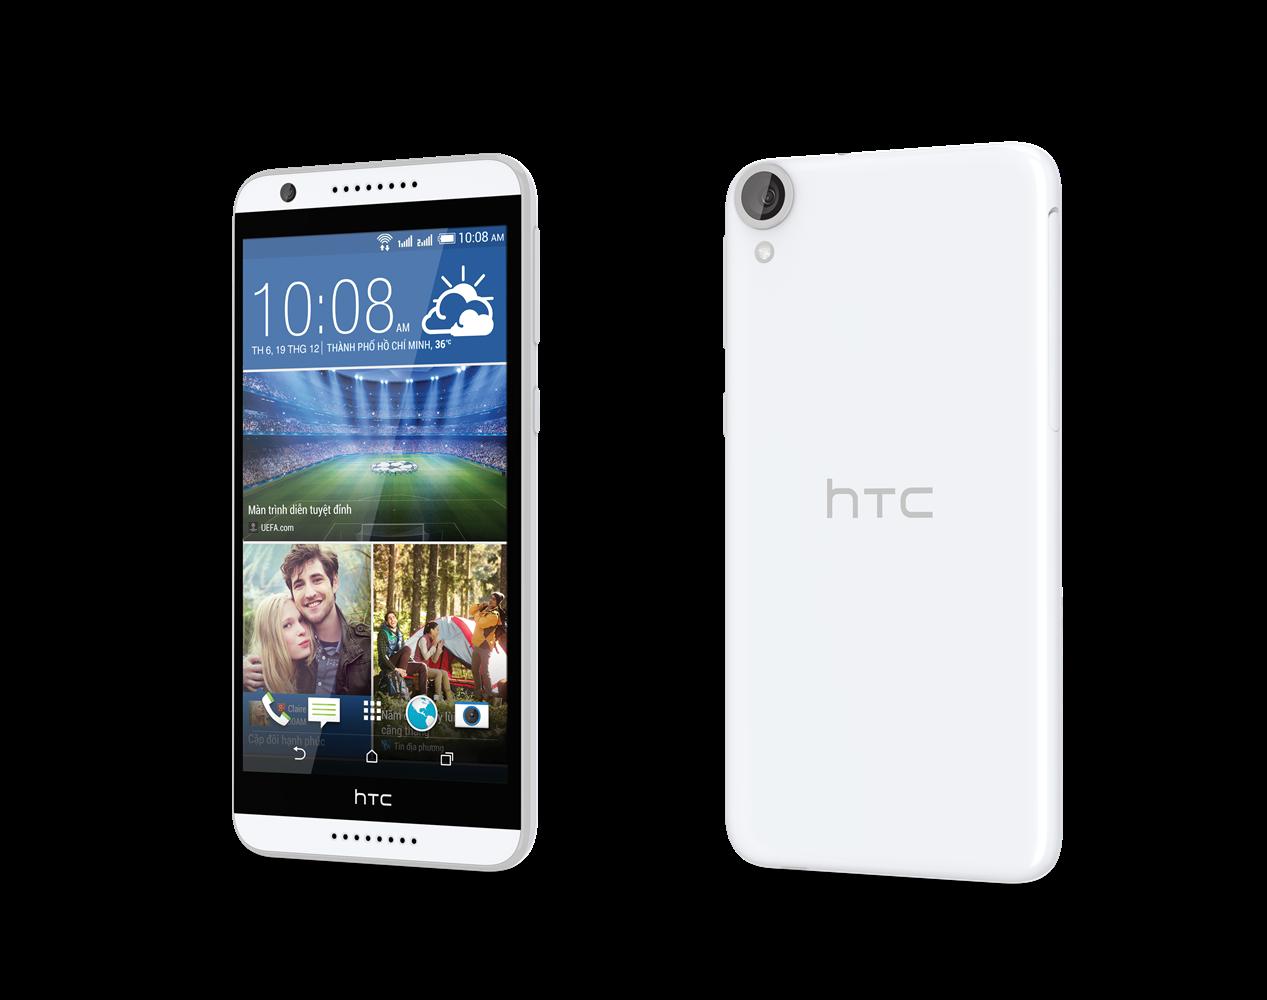 HTC Desire 820G+: Chip lõi 8, loa Boomsound, màn 5,5 inch, giá 4 triệu đồng